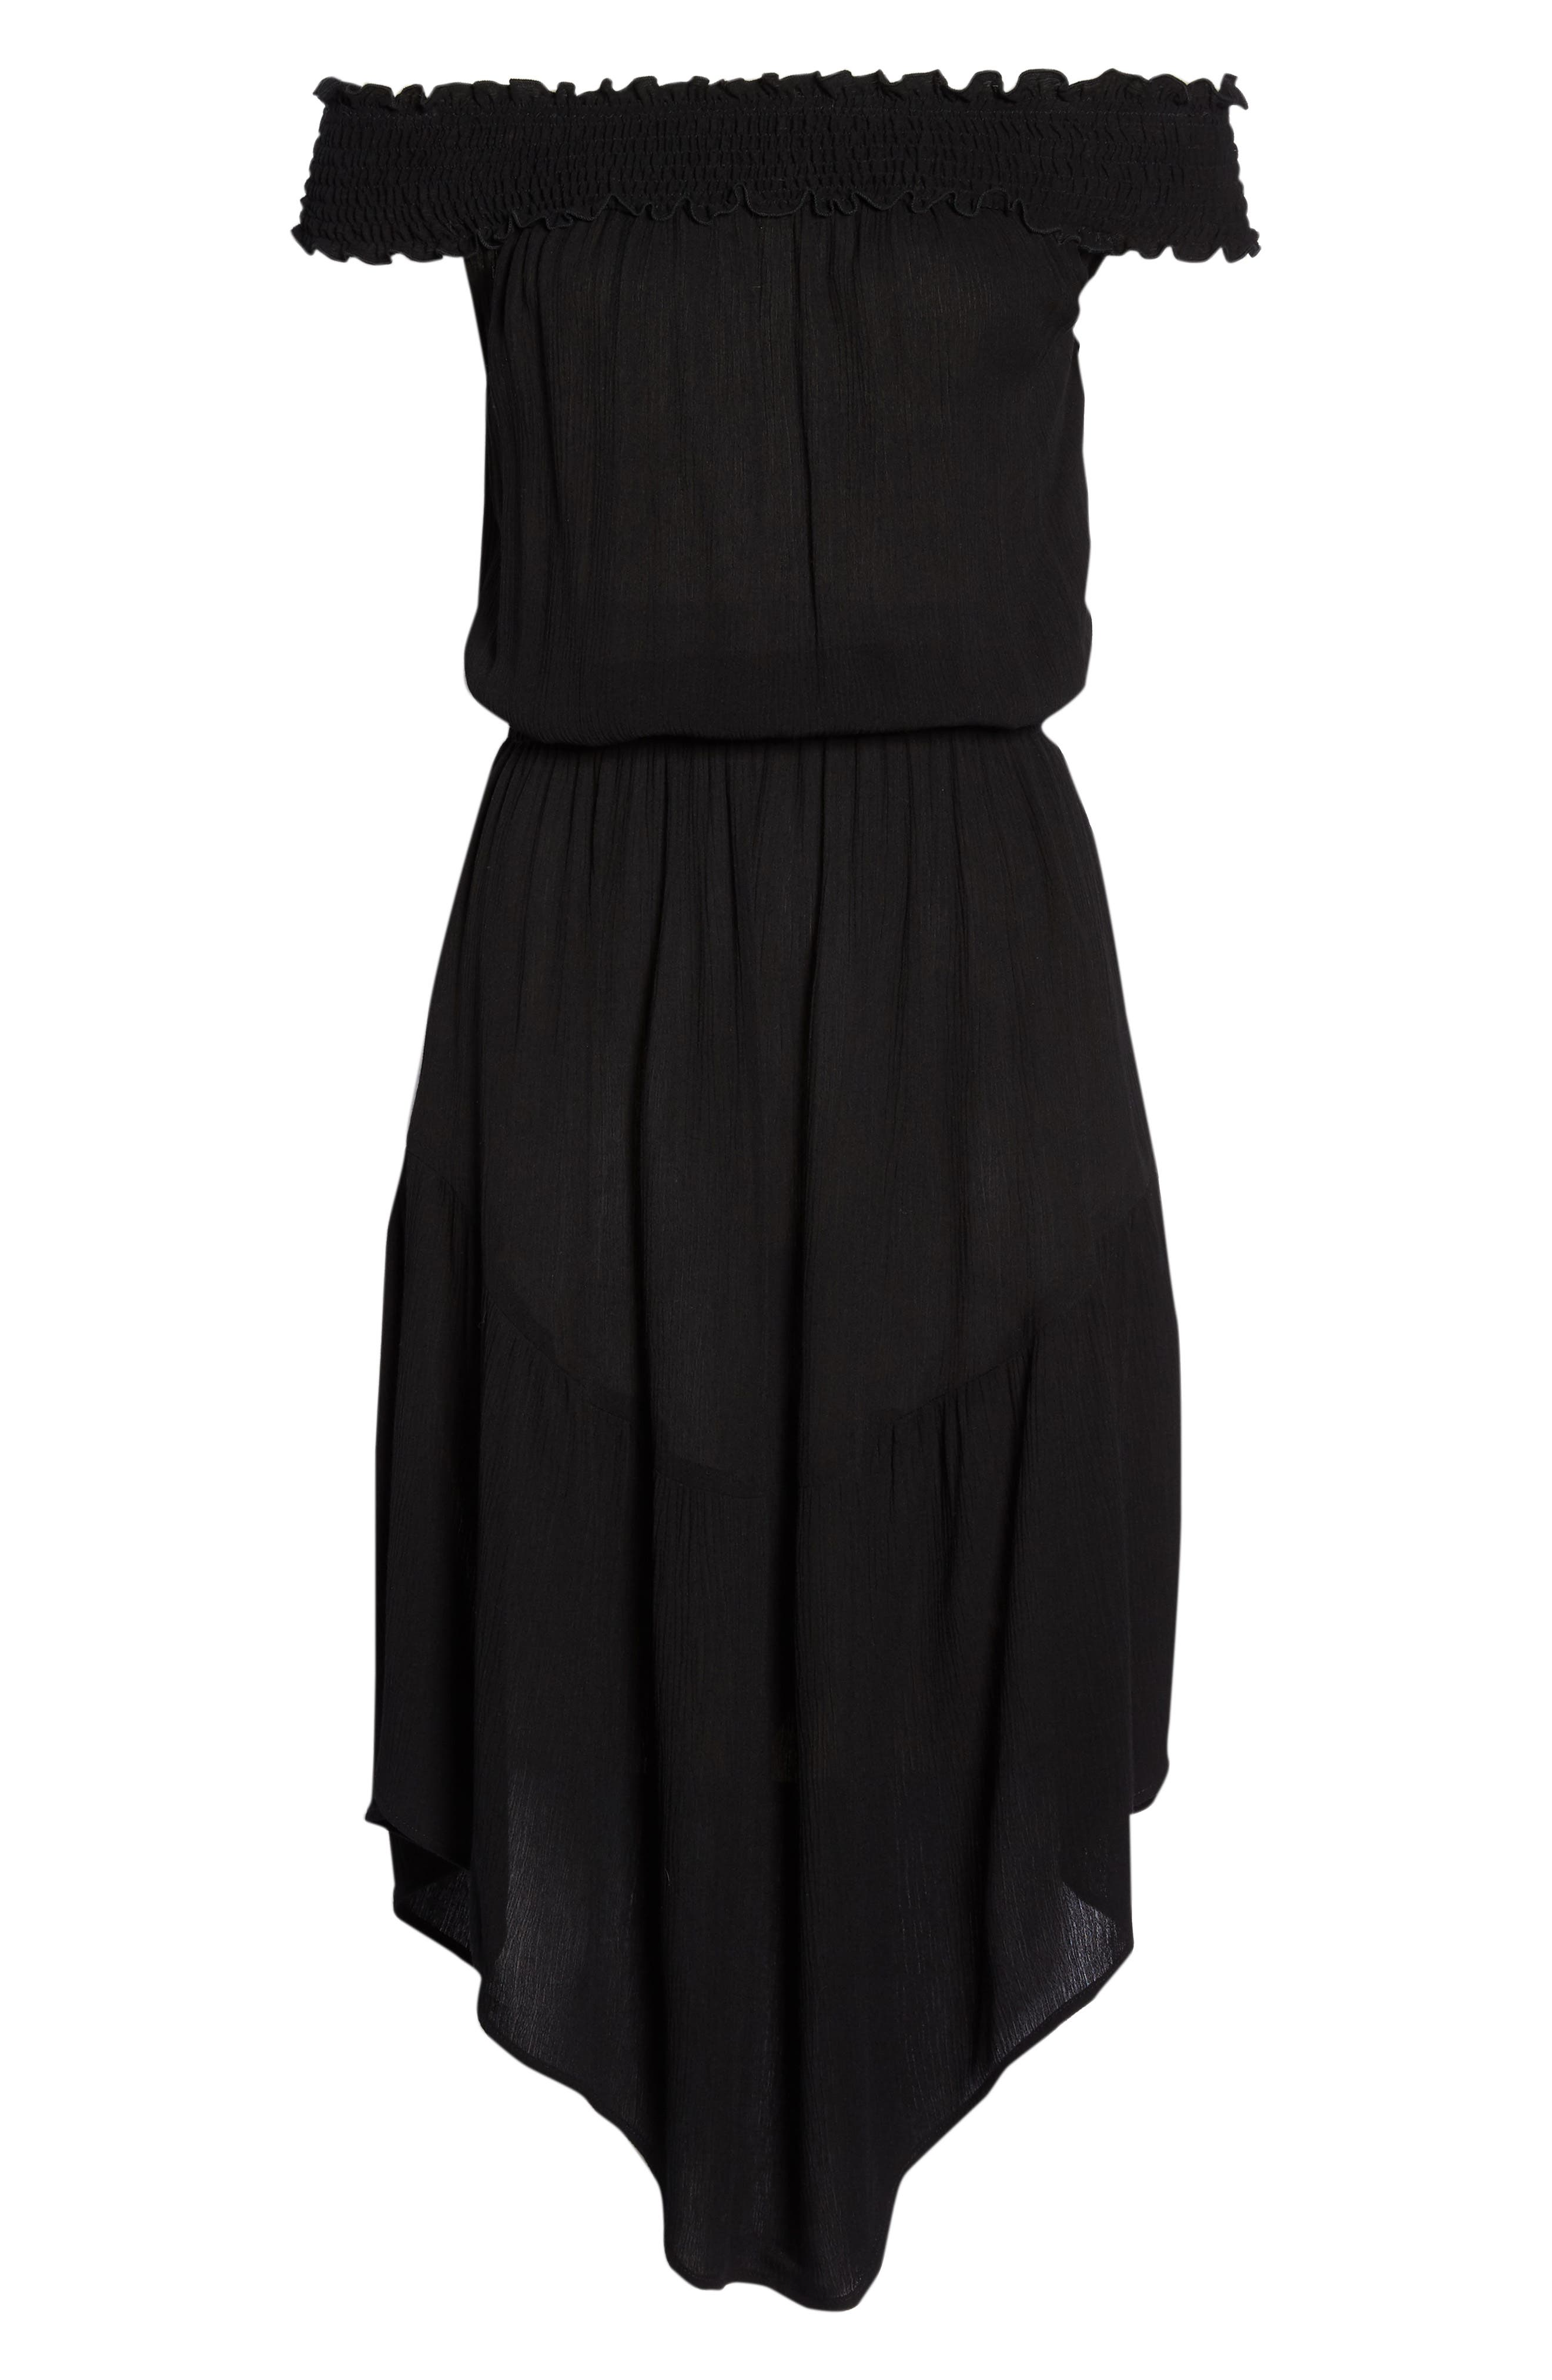 Summer Breeze Off the Shoulder Cover-Up Dress,                             Alternate thumbnail 6, color,                             Black